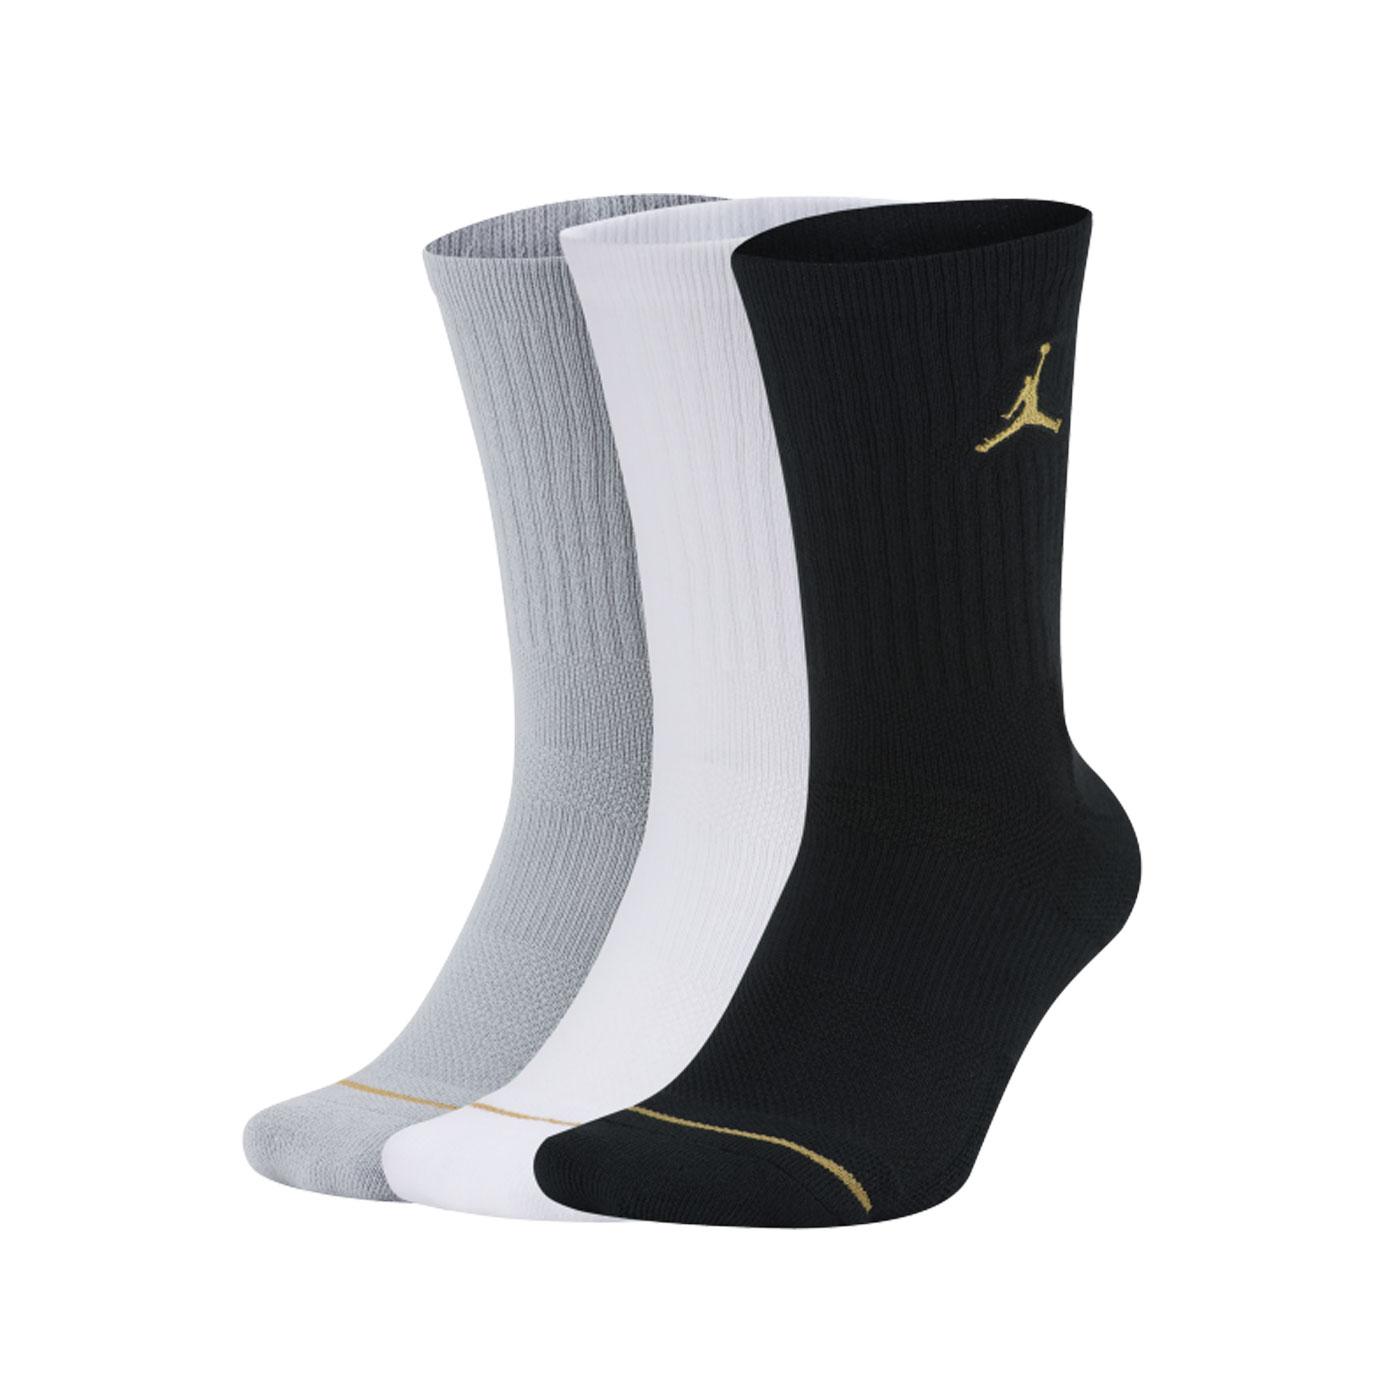 NIKE 長襪(三入裝) SX5545-915 - 黑白灰金